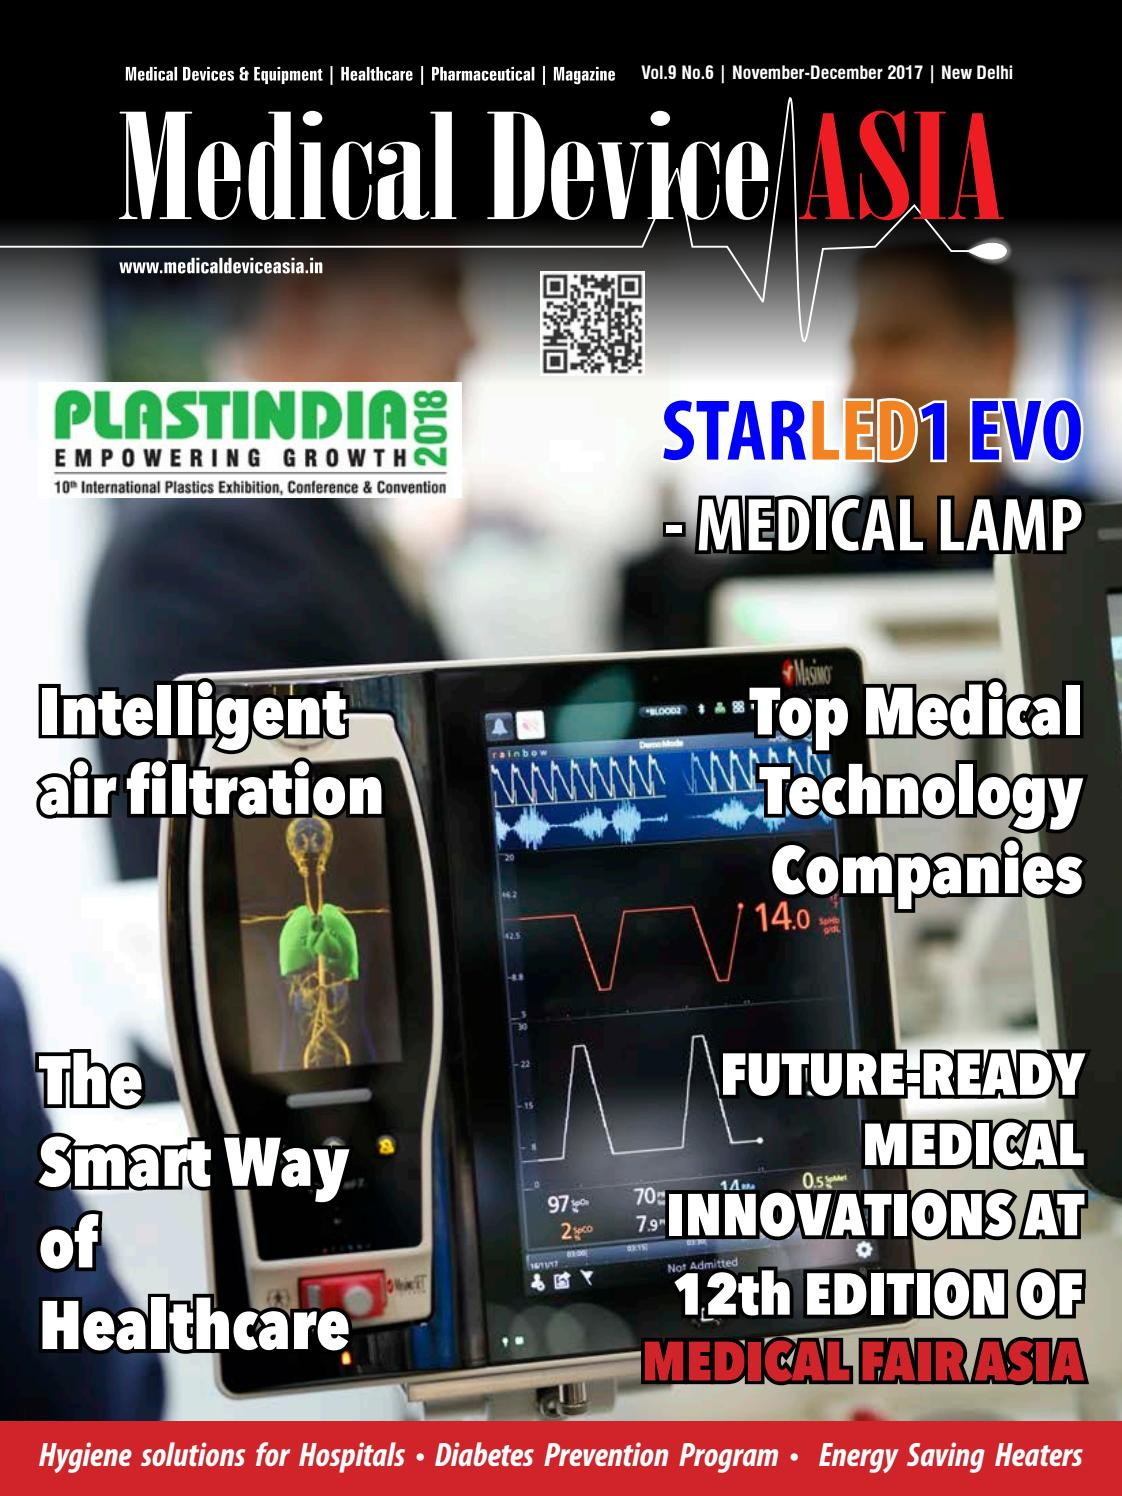 Medical Device Asia Nov-Dec 2017 by Worldwide Publications